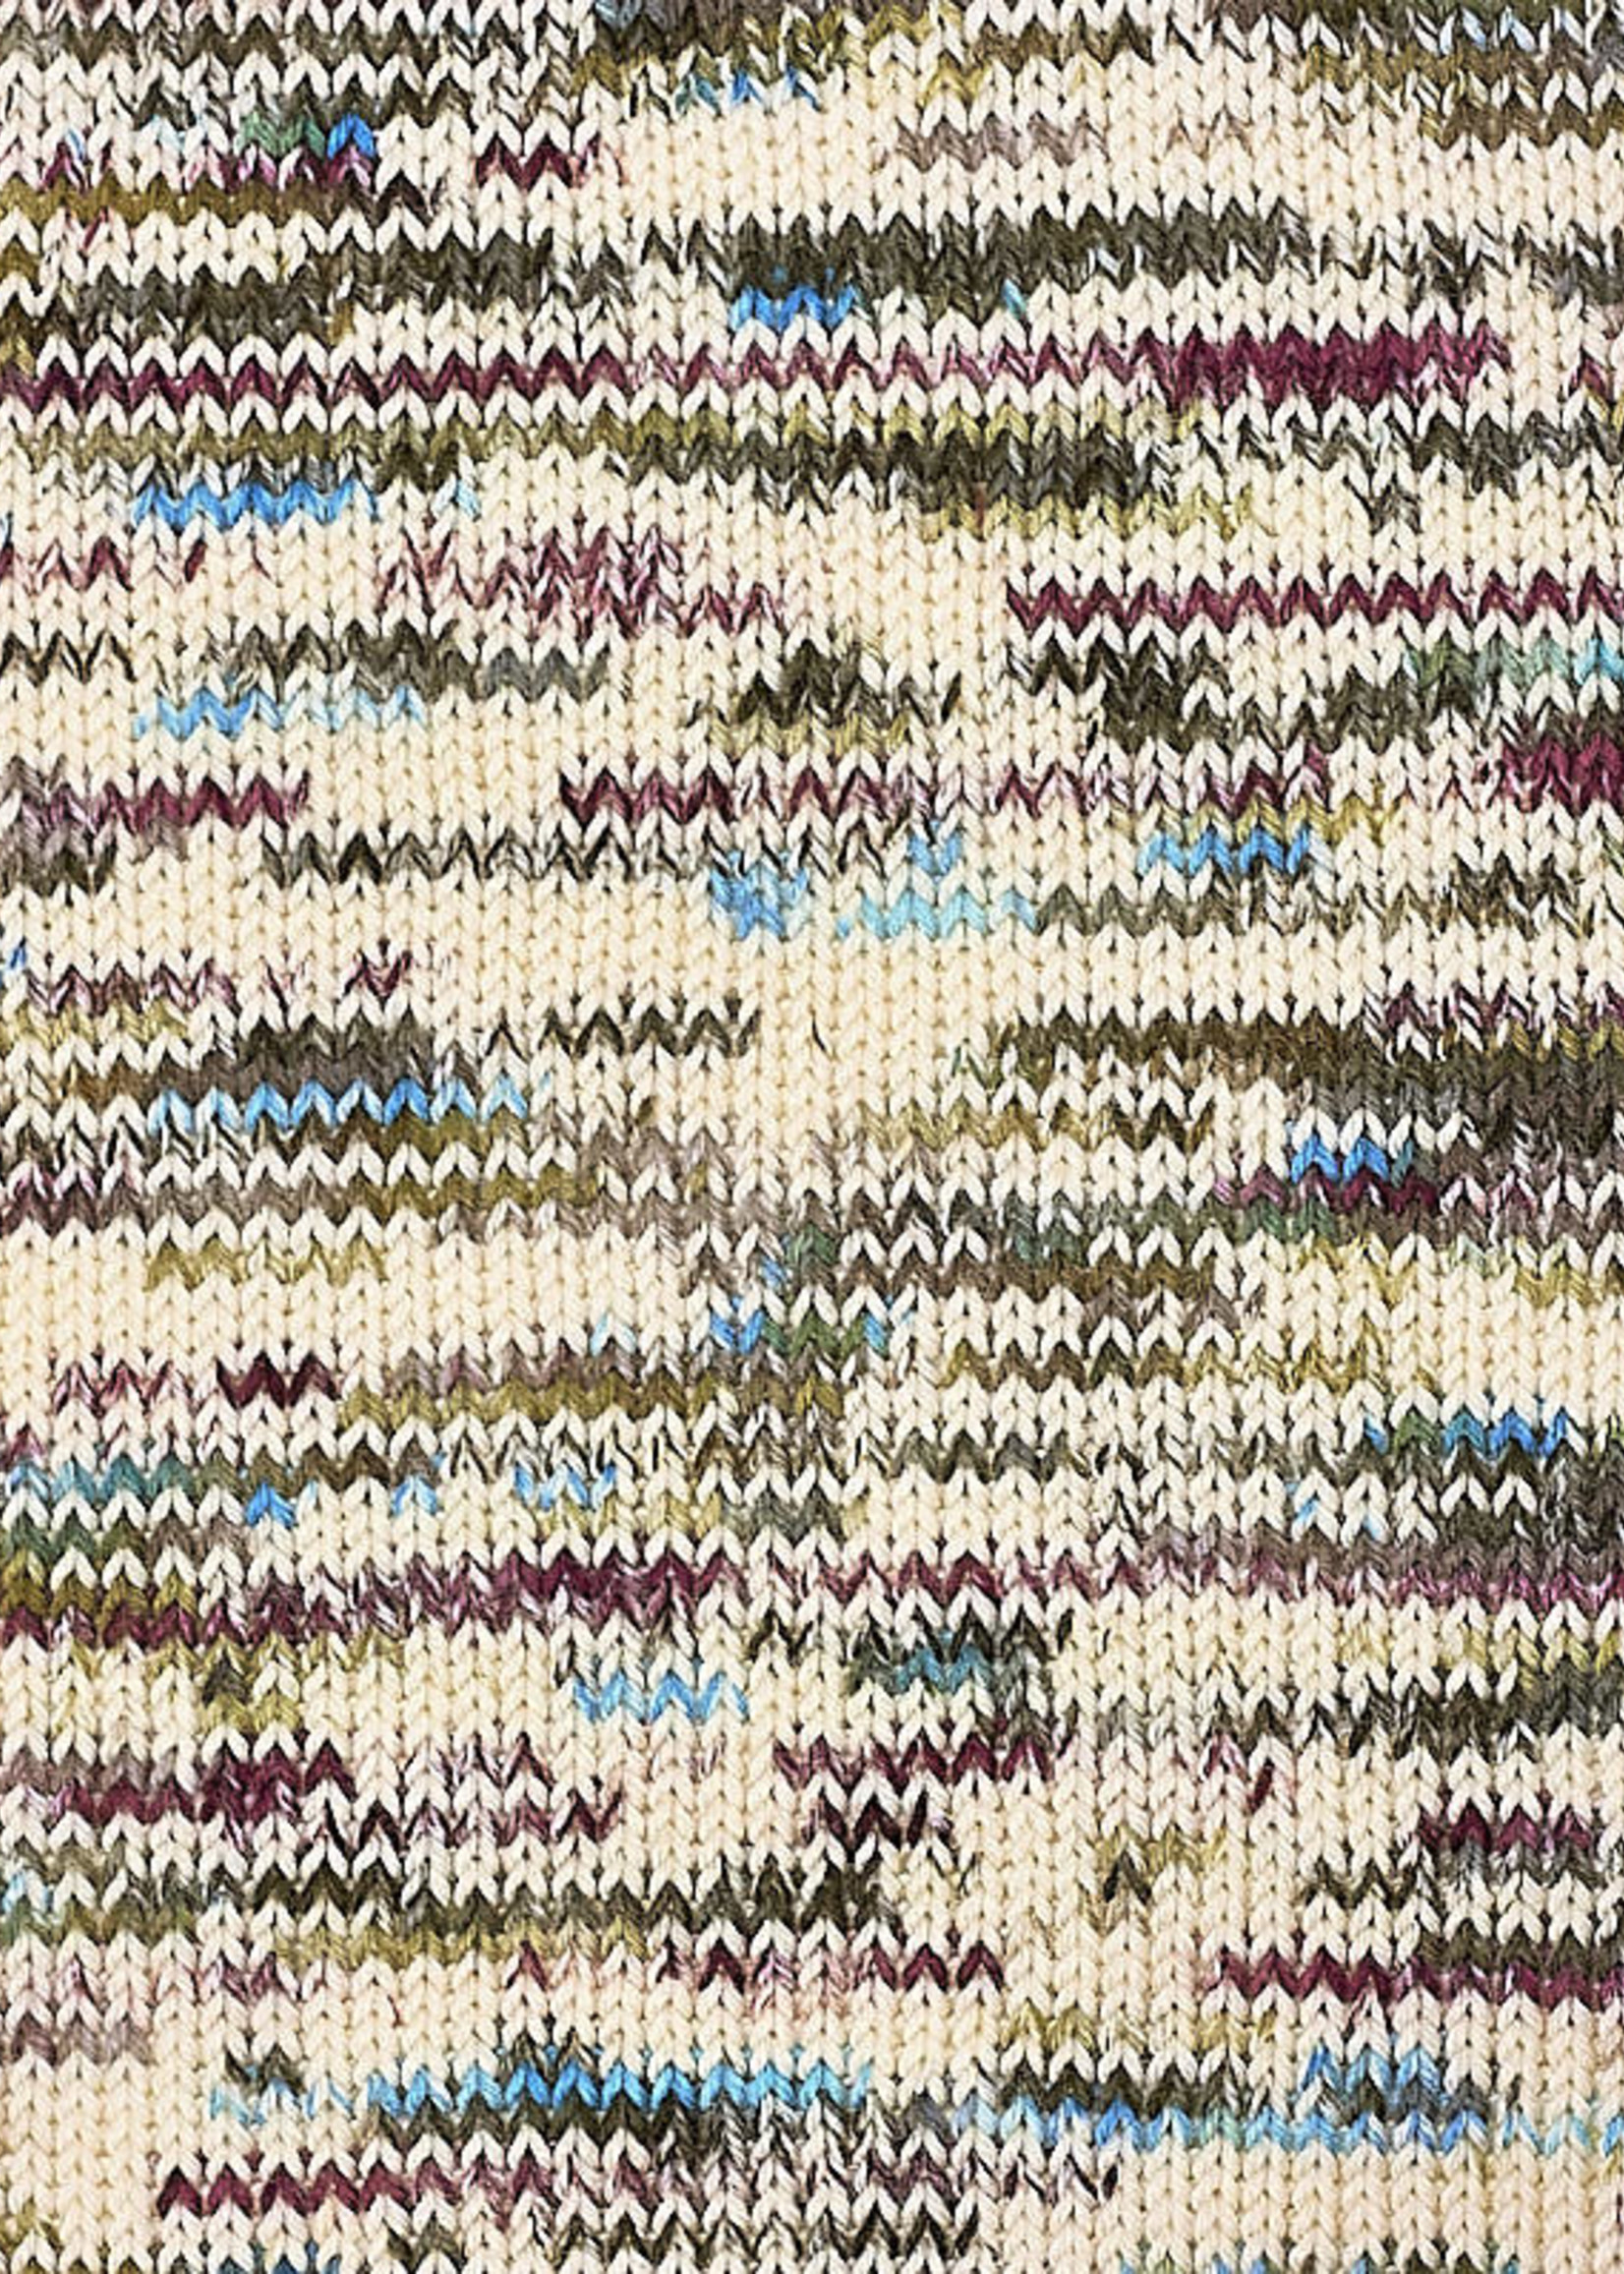 Berroco Berroco Ultra Wool Handpaint 33300 Seabreeze